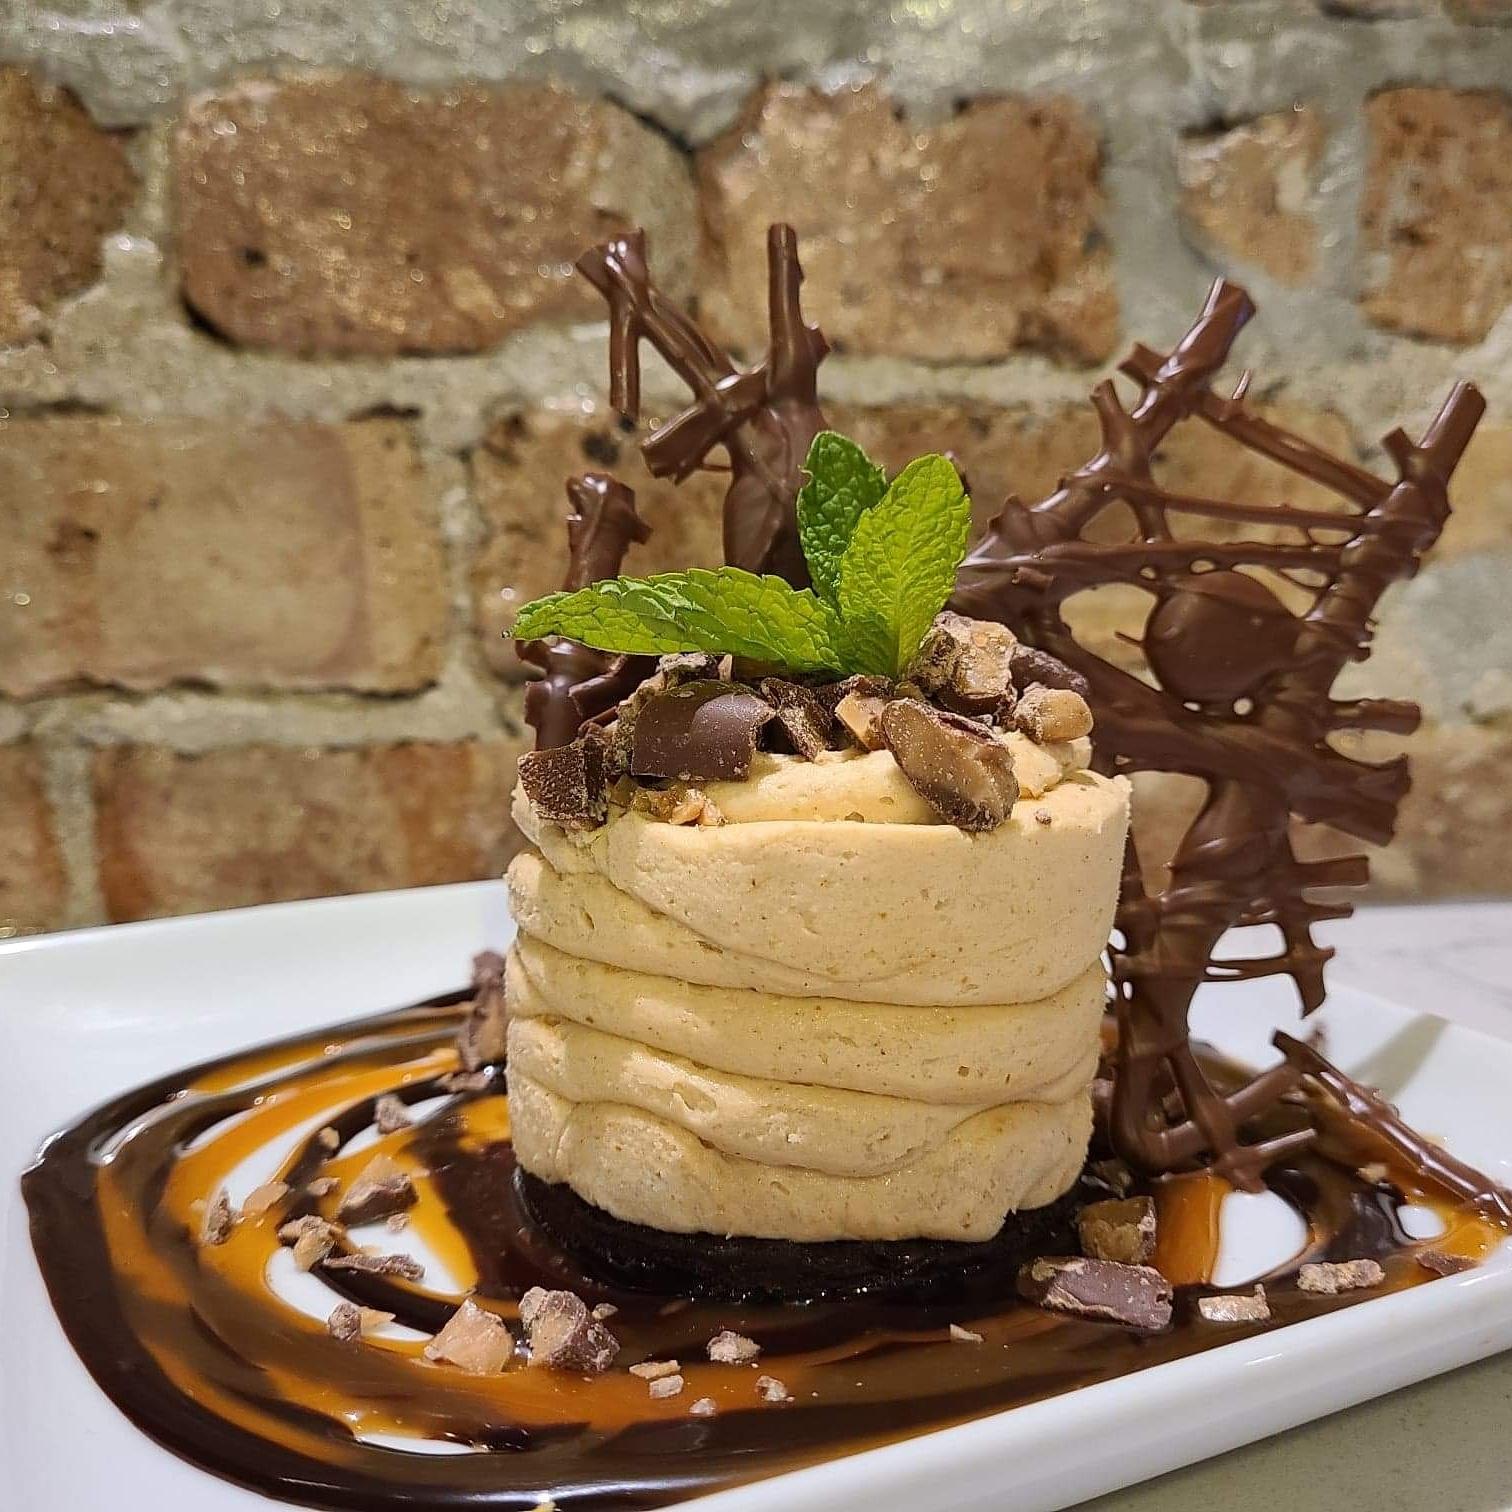 SOB Peanut Butter Forrest Dessert